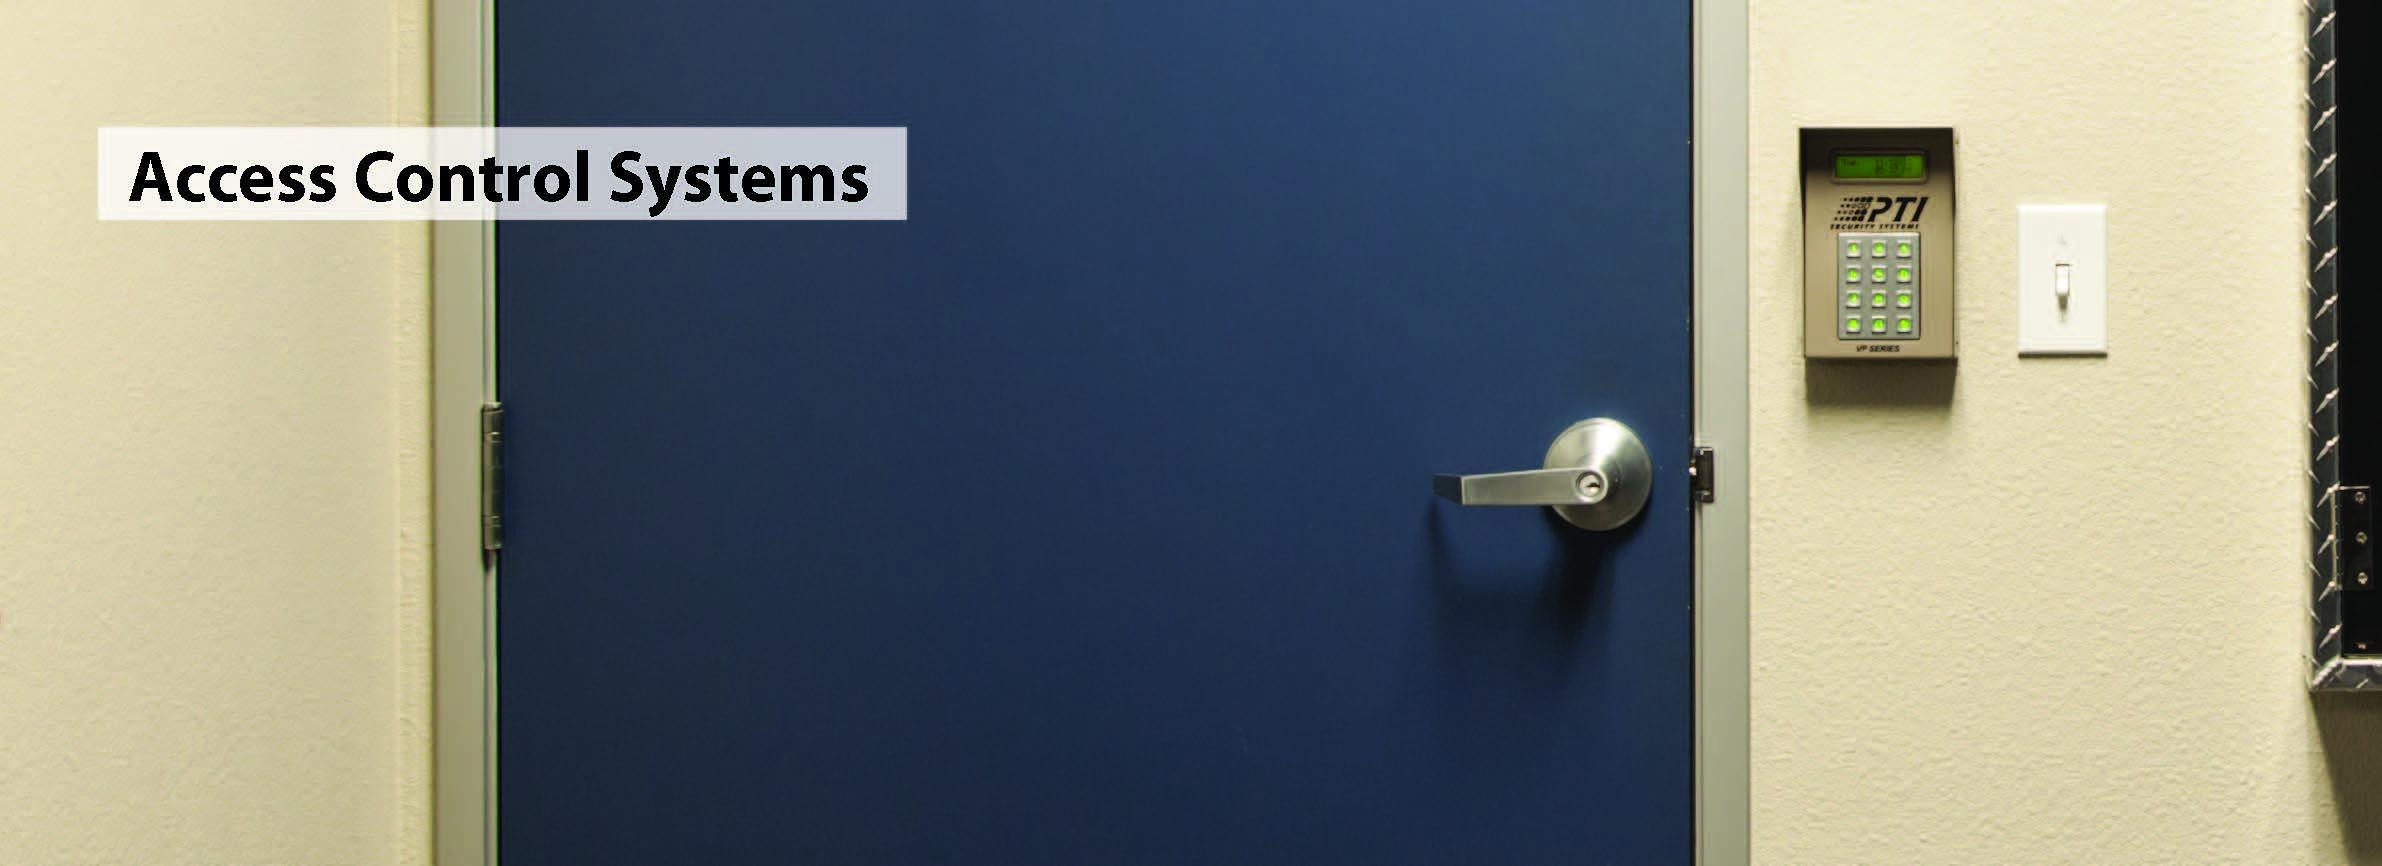 san luis obispo access control systems